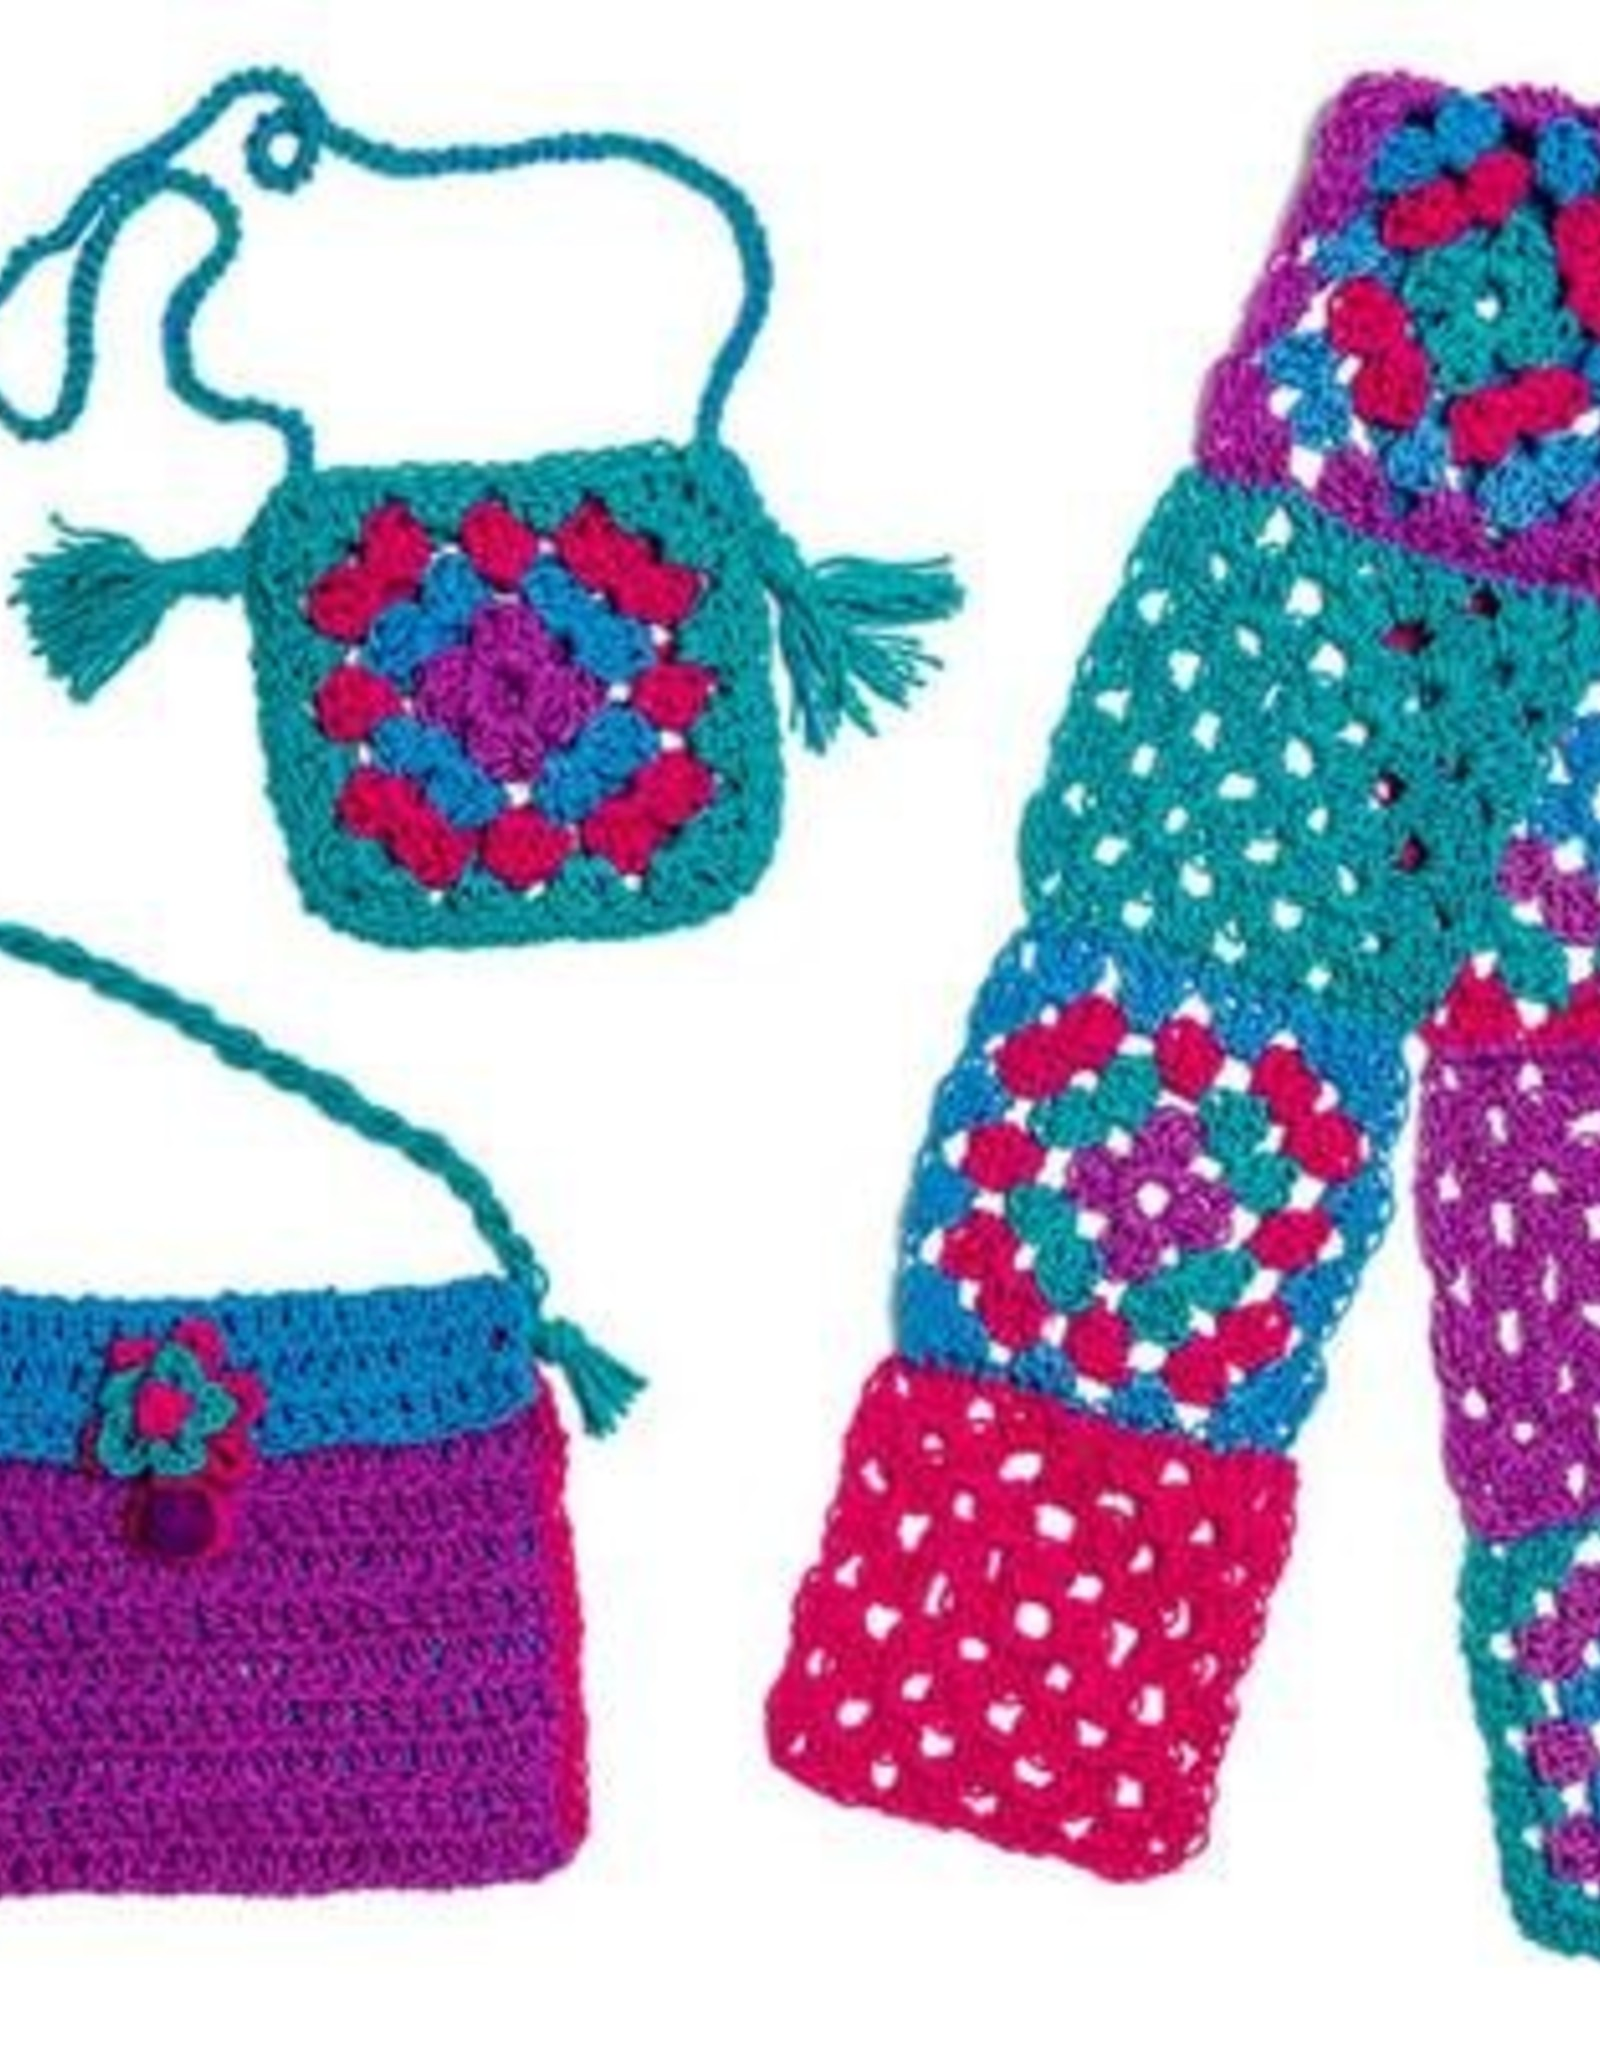 Harrisville Designs Harrisville Designs Discover Crochet for kids